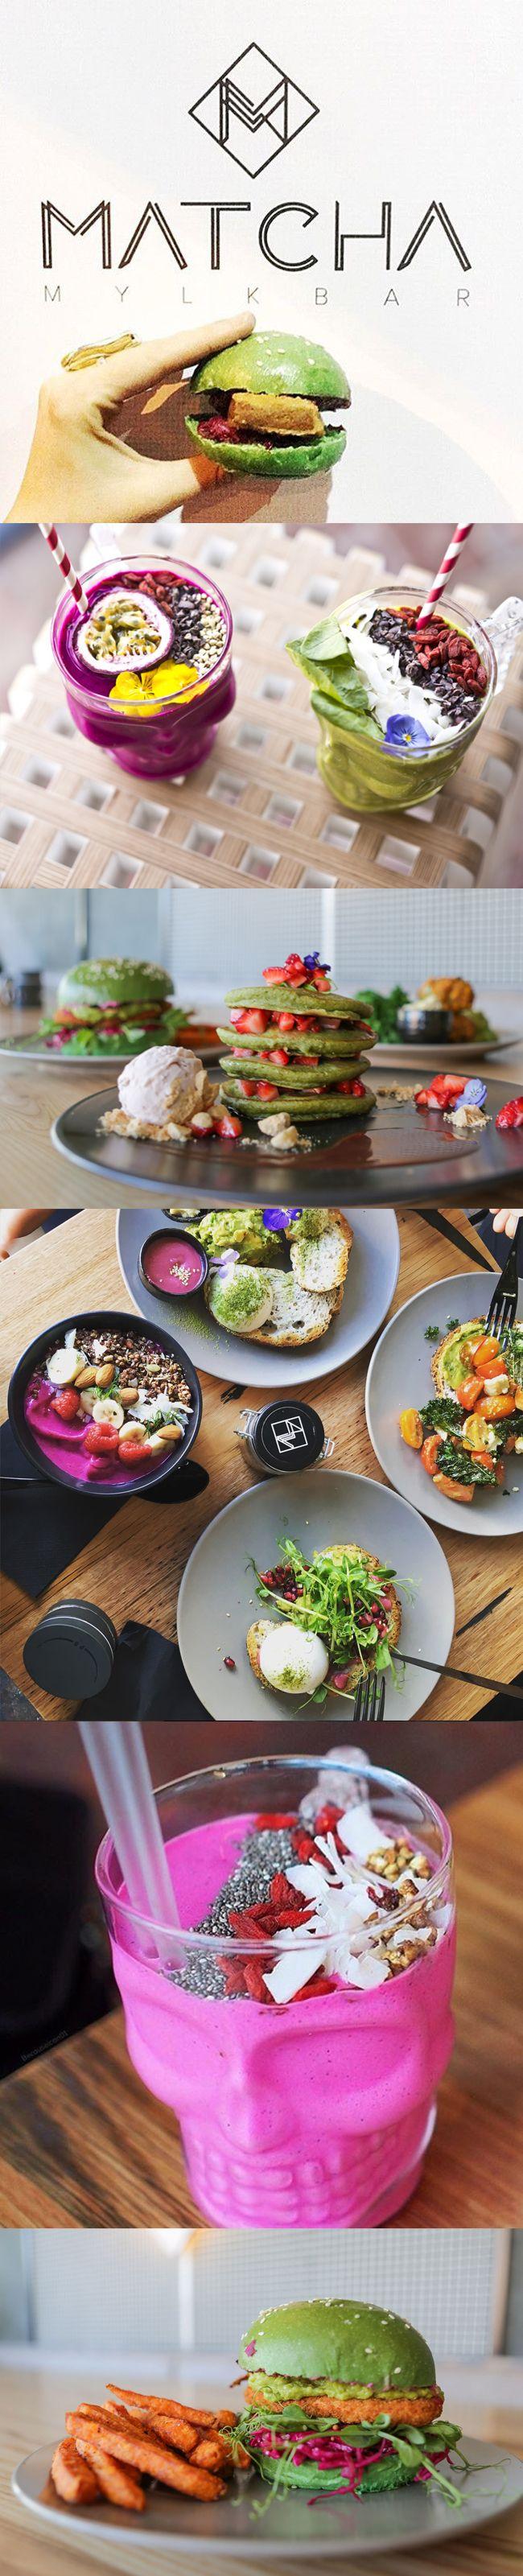 Vegan Cafe // Matcha Mylkbar, St Kilda, Melbourne